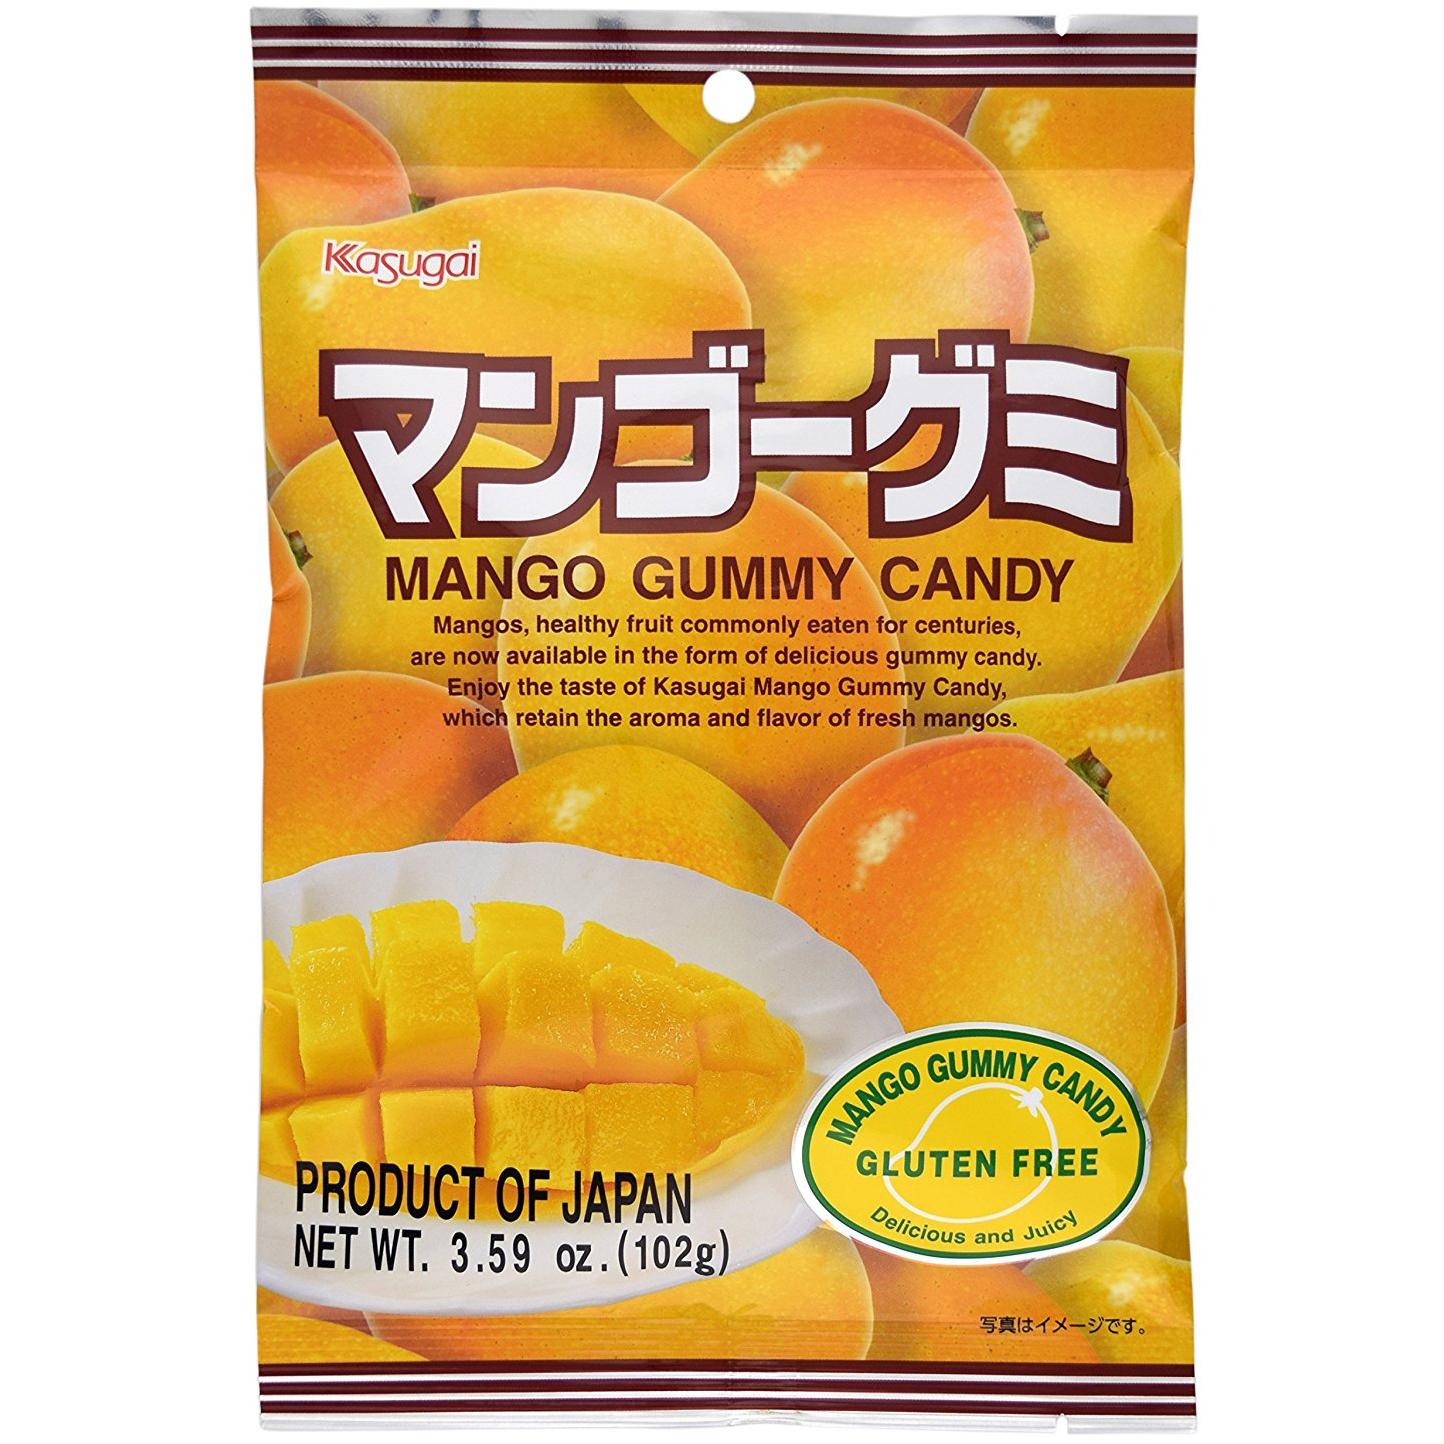 KASUGAI - MANGO GUMMY CANDY - GLUTEN FREE - 3.59oz